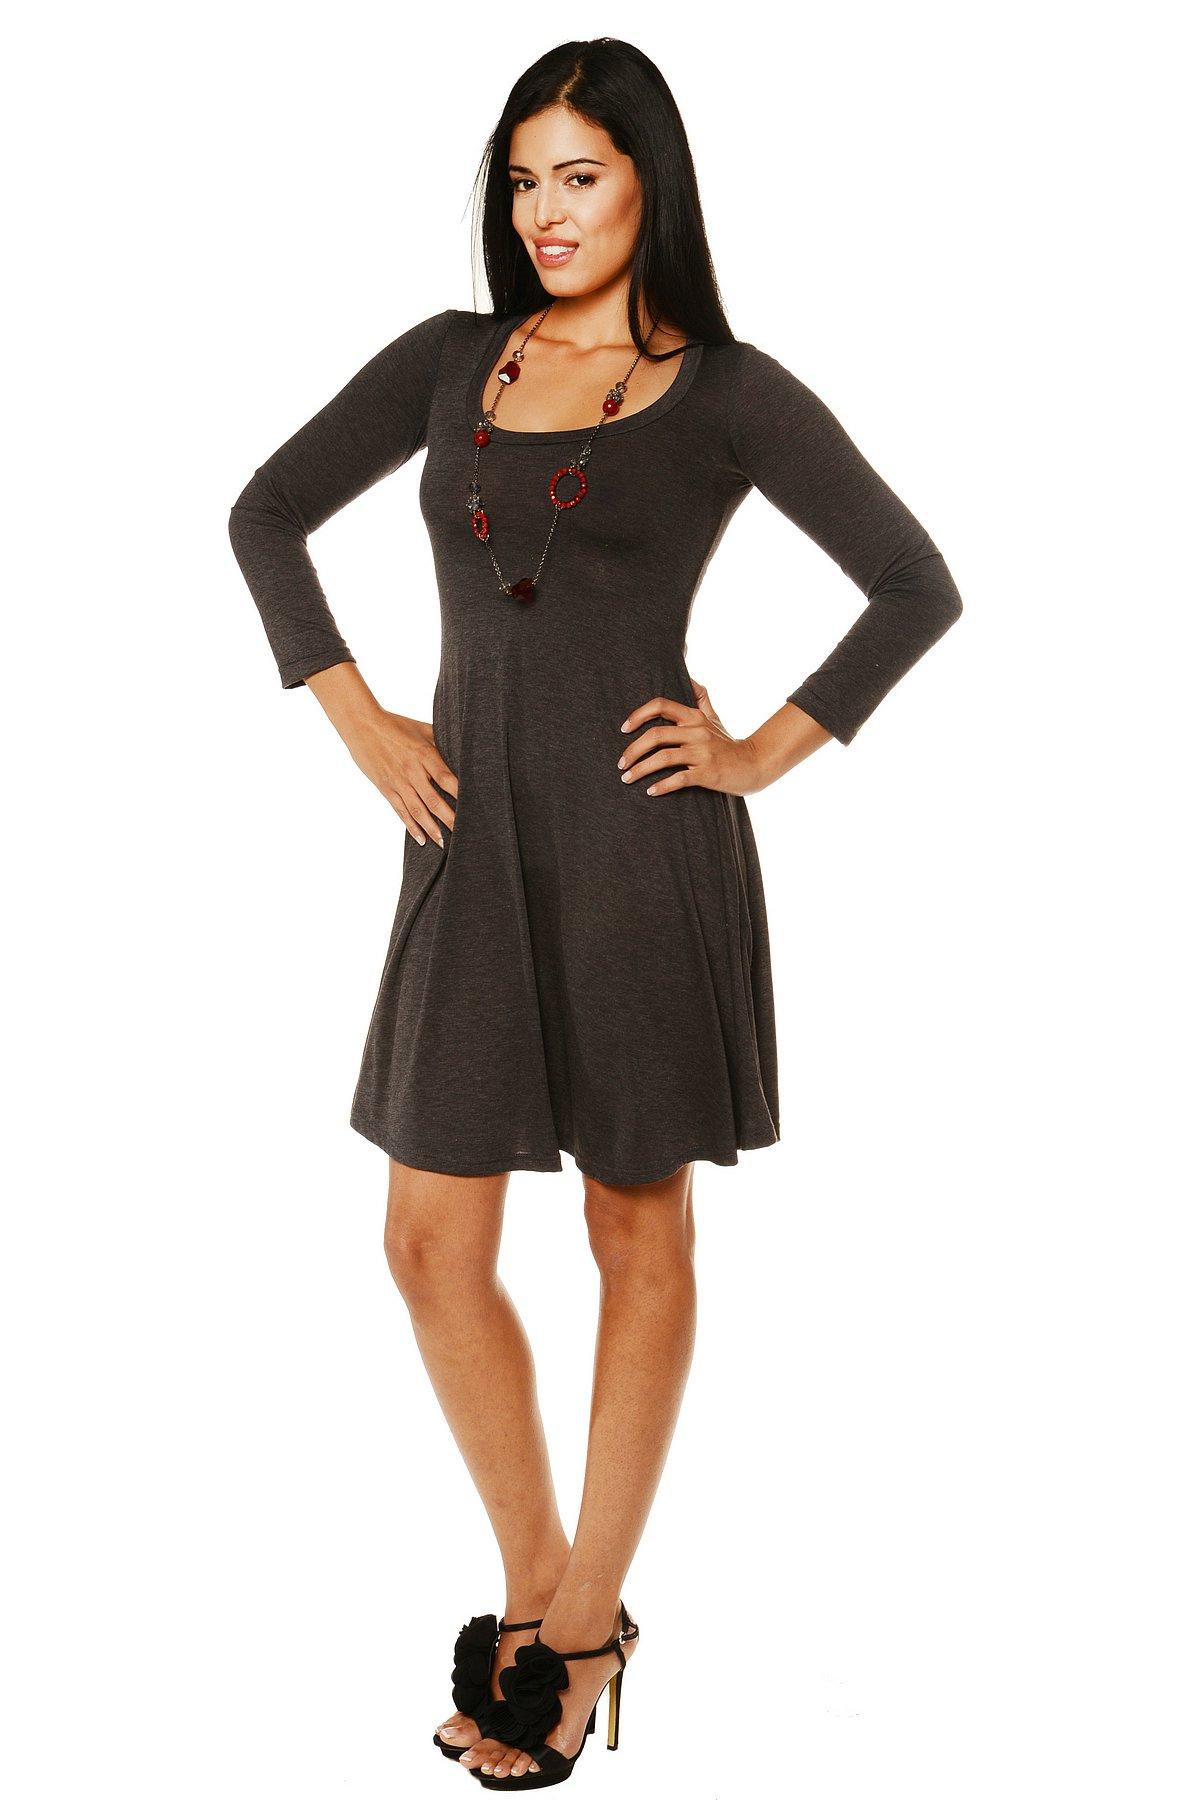 24/7 Comfort Apparel Women's Long-sleeve Dress at Sears.com